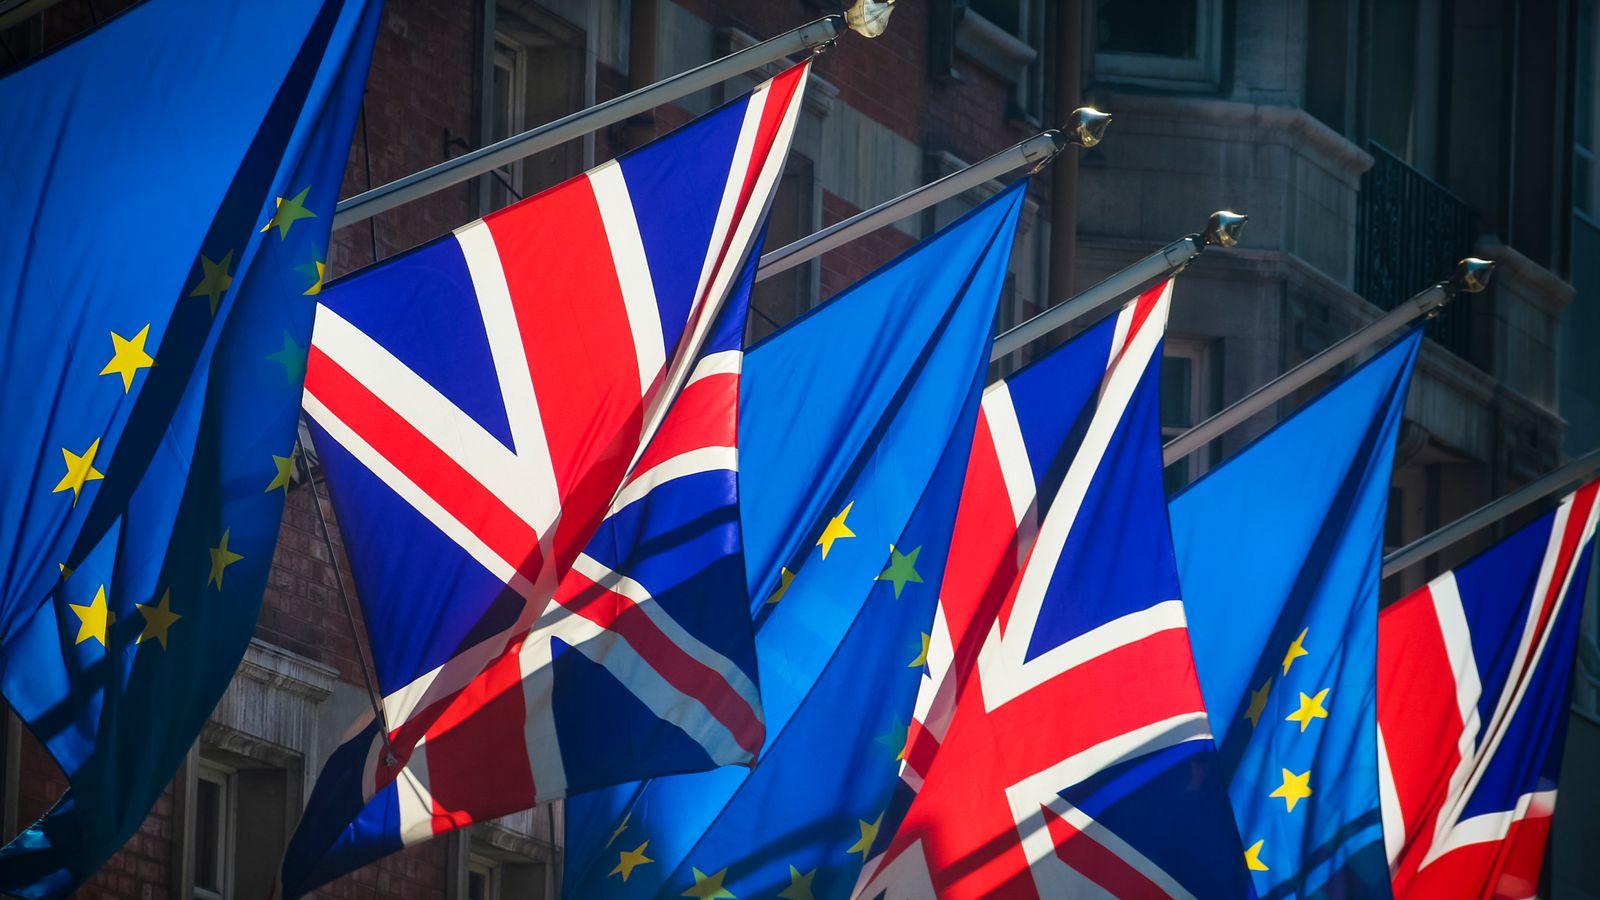 Brexit: Boris Johnson to warn EU boss that UK won't pay full divorce bill under no deal